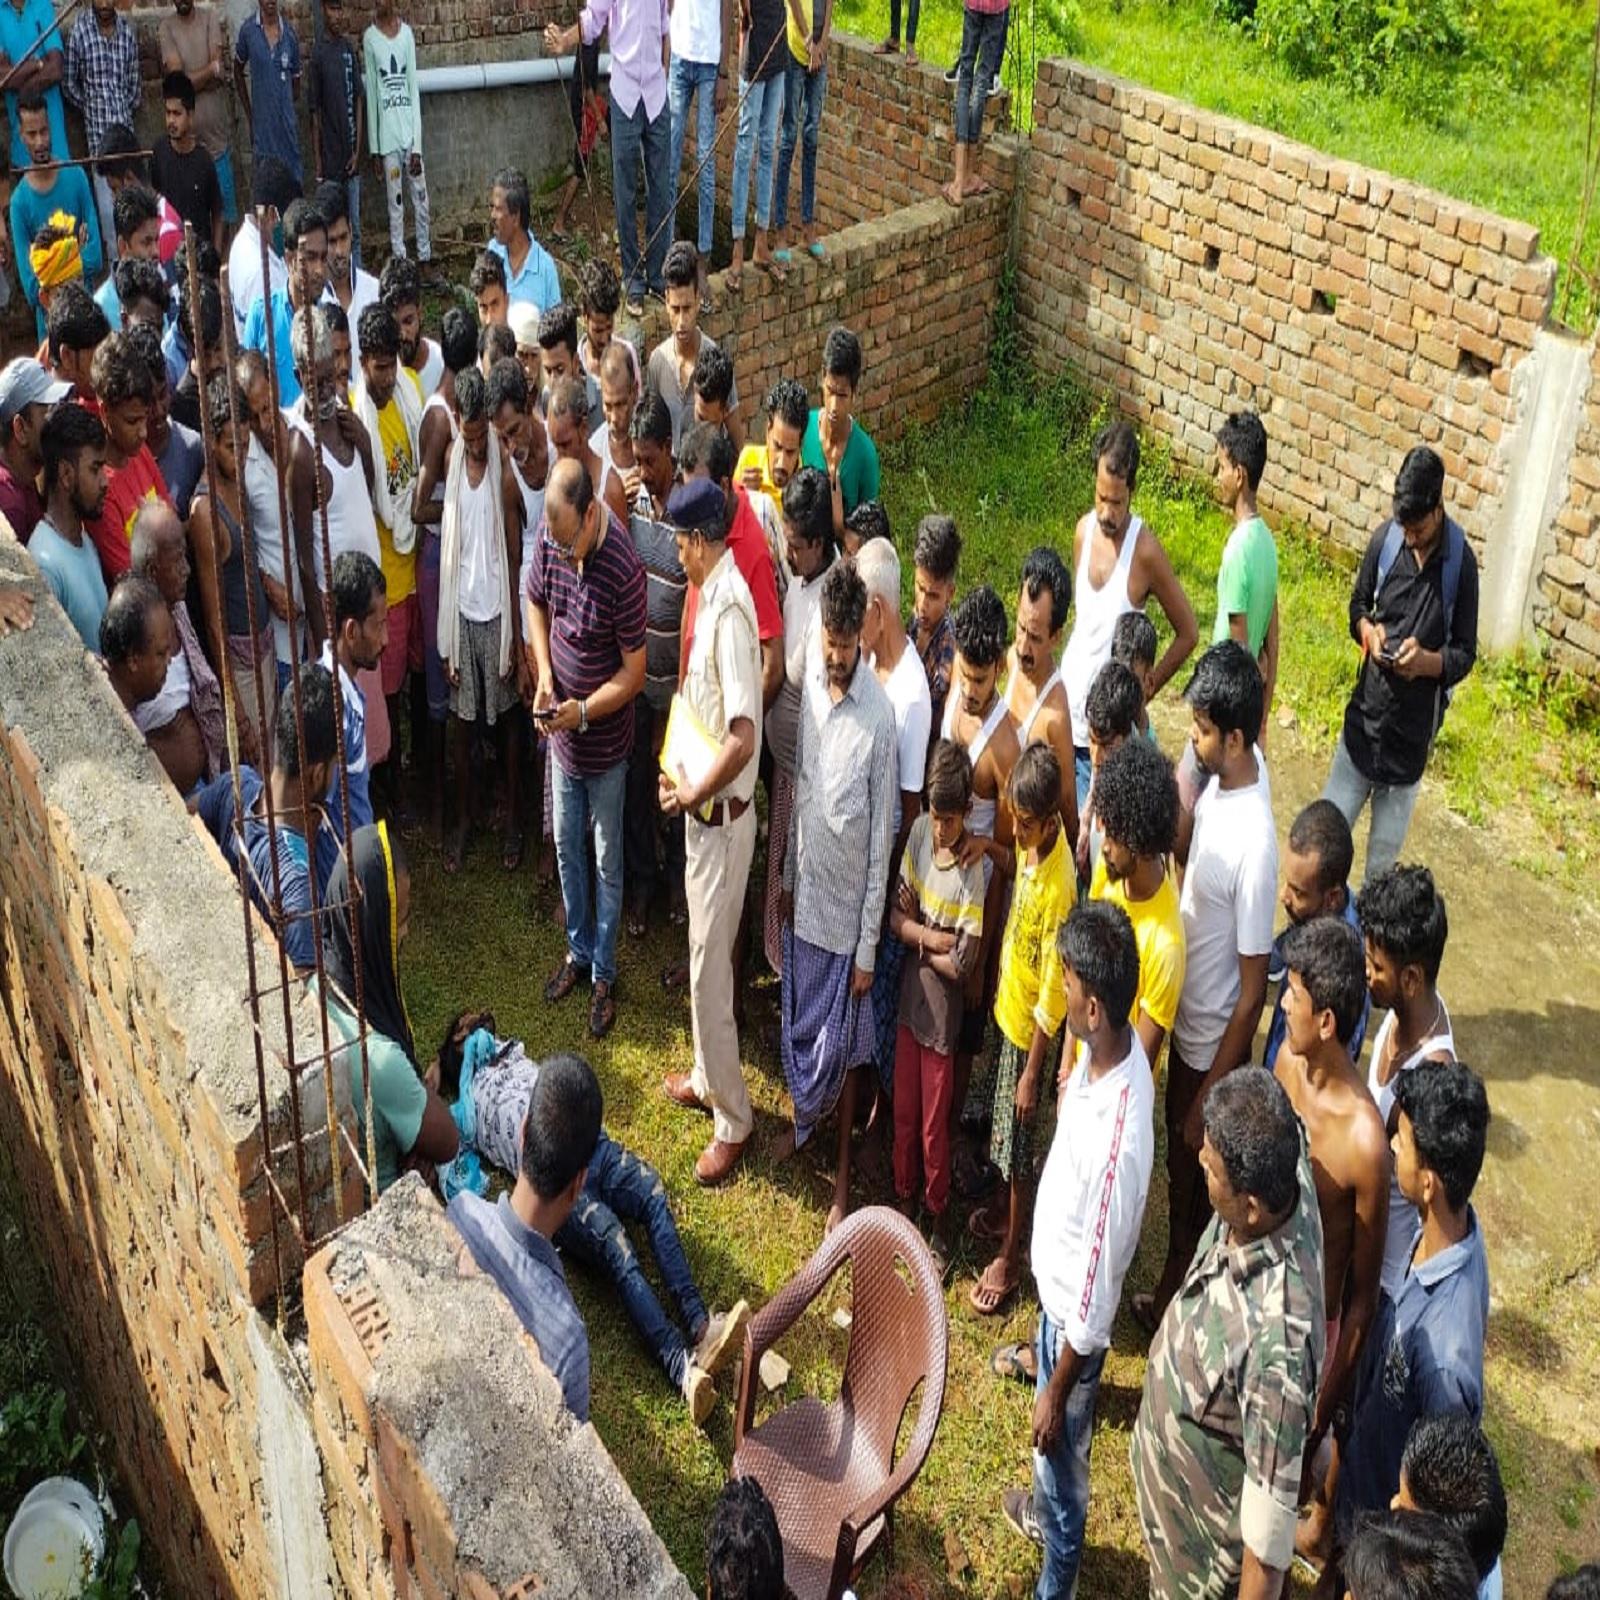 man who did intercaste marriage his body found hanging in under  construction pillar wife commit suicide year before nodmk3 - Dumka News:  बगावत कर की थी इंटरकास्ट मैरिज, पहले युवती ने किया